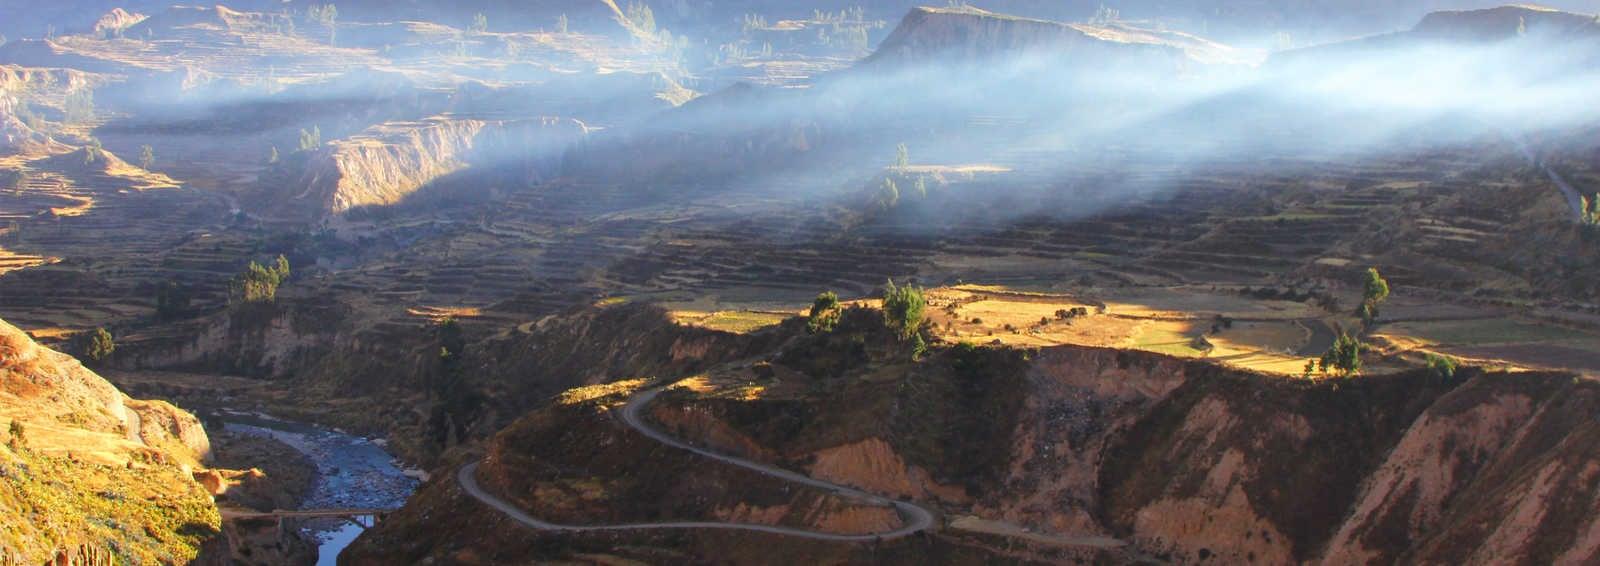 Colca Canyon Inca terracing